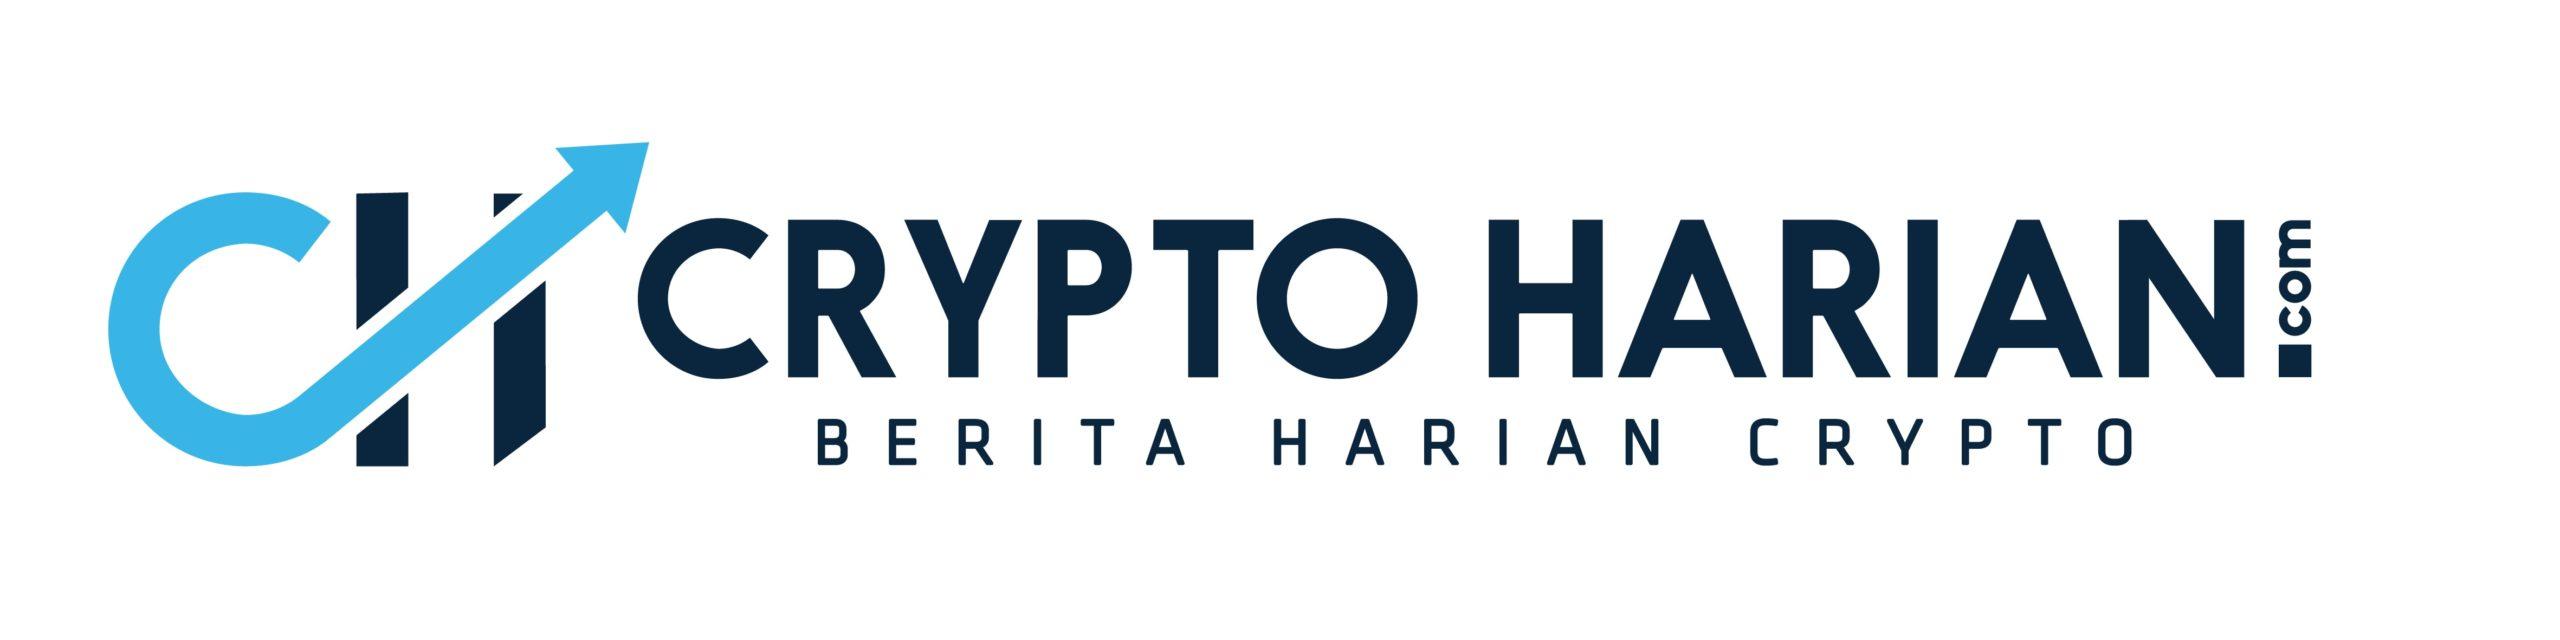 CryptoHarian